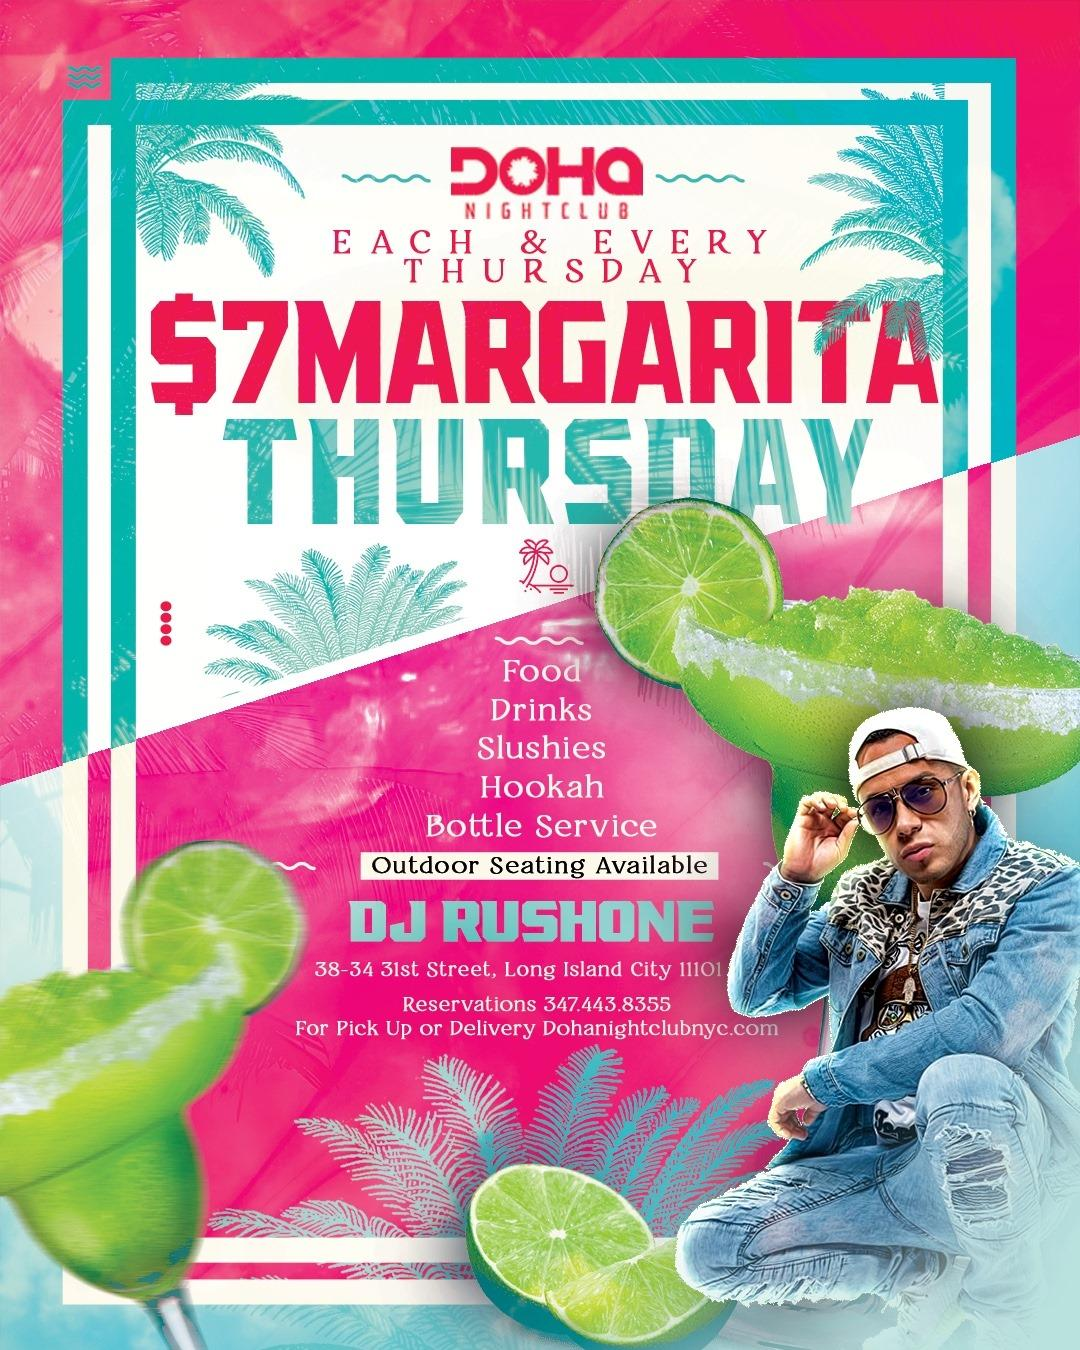 $7 Margarita Thursdays at Doha Nightclub NYC